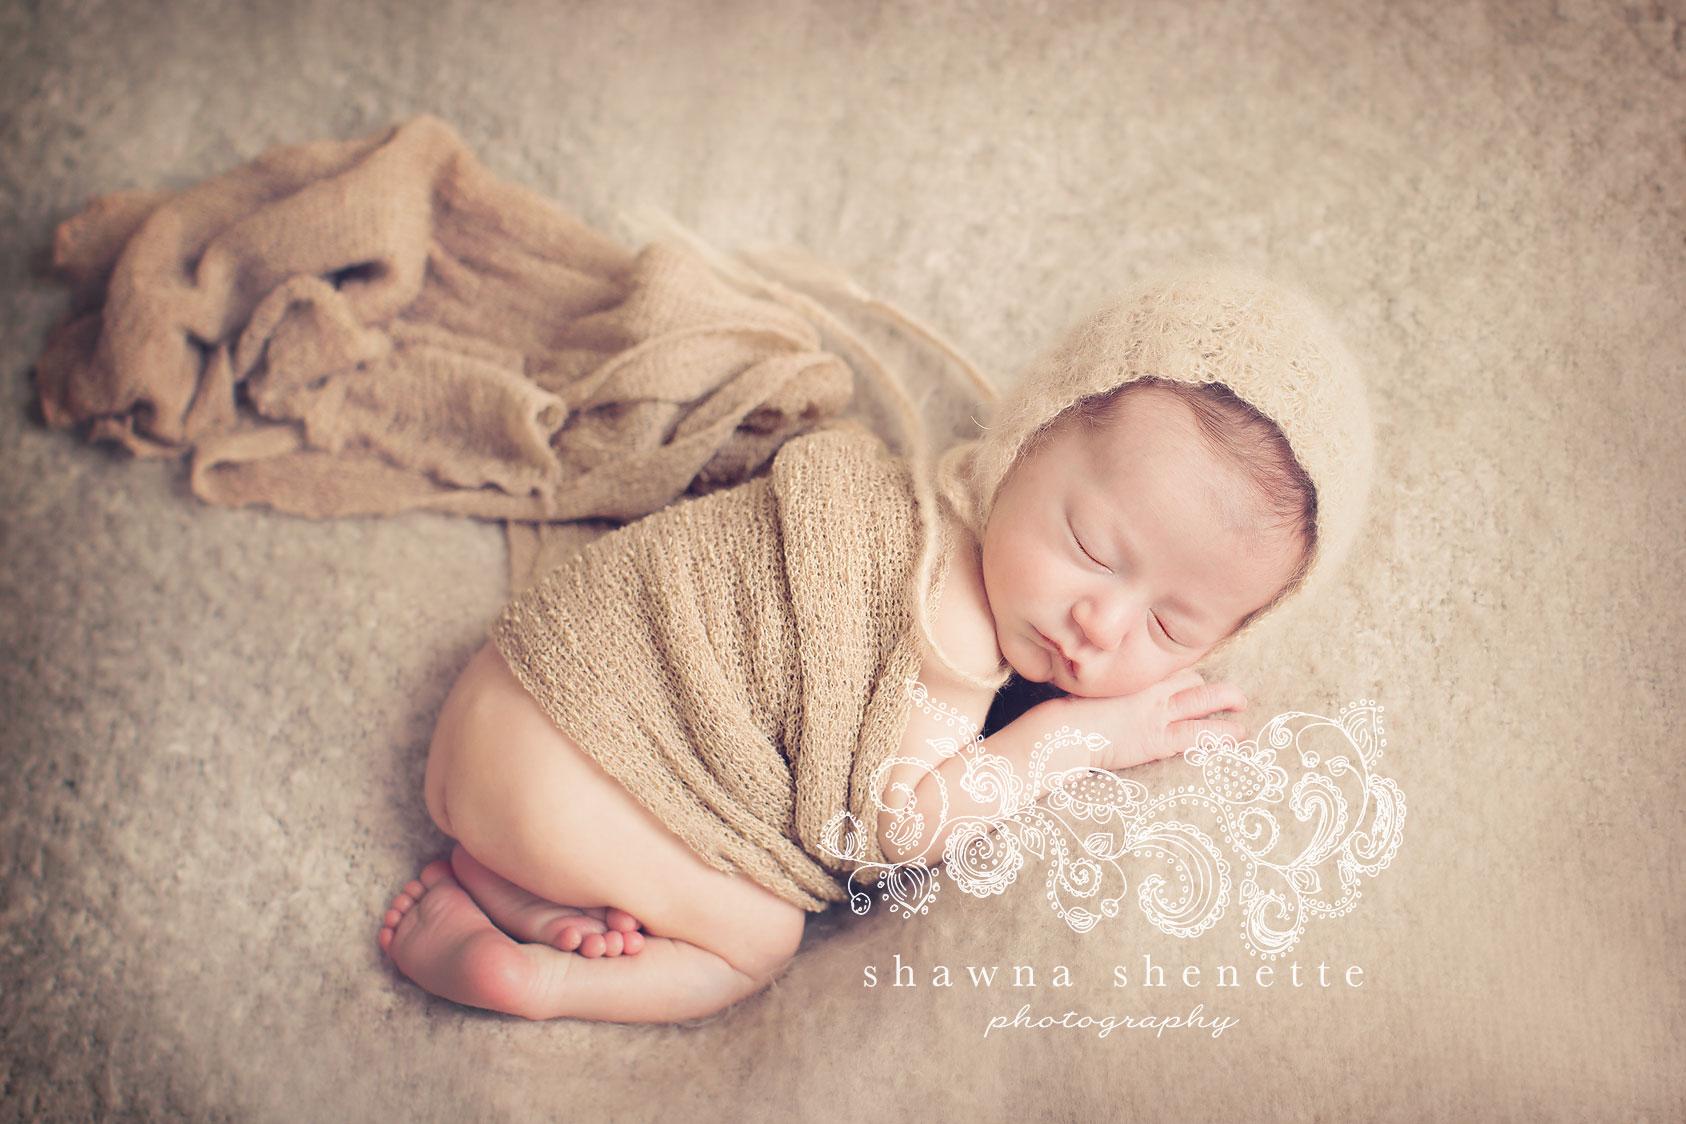 massachusetts newborn baby boy photographer best millbury central ma auburn worcester leicester sutton grafton